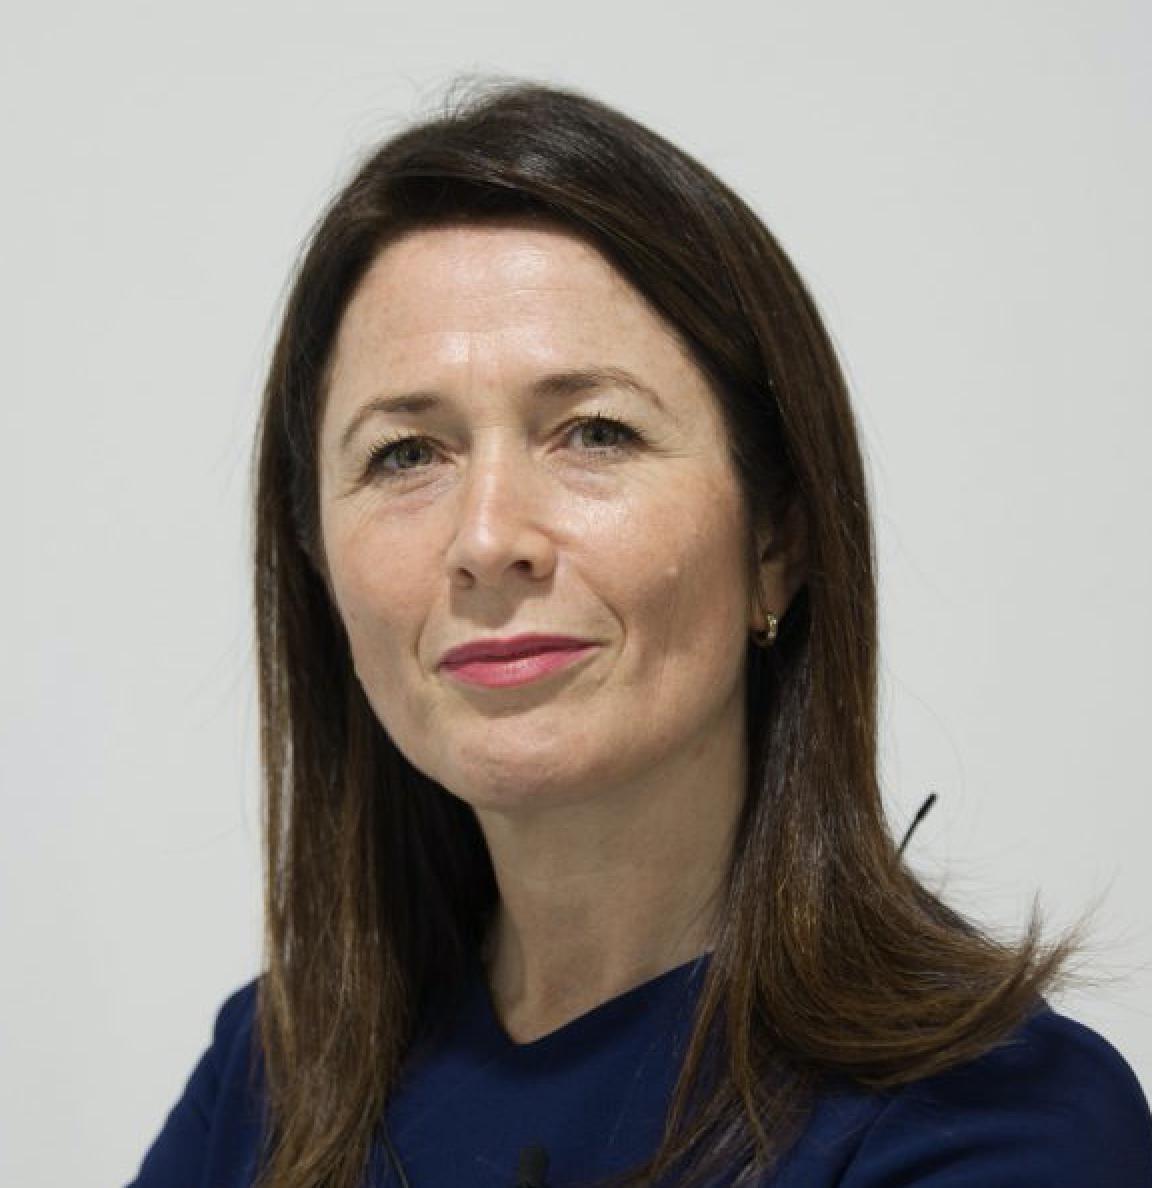 Julia Muir